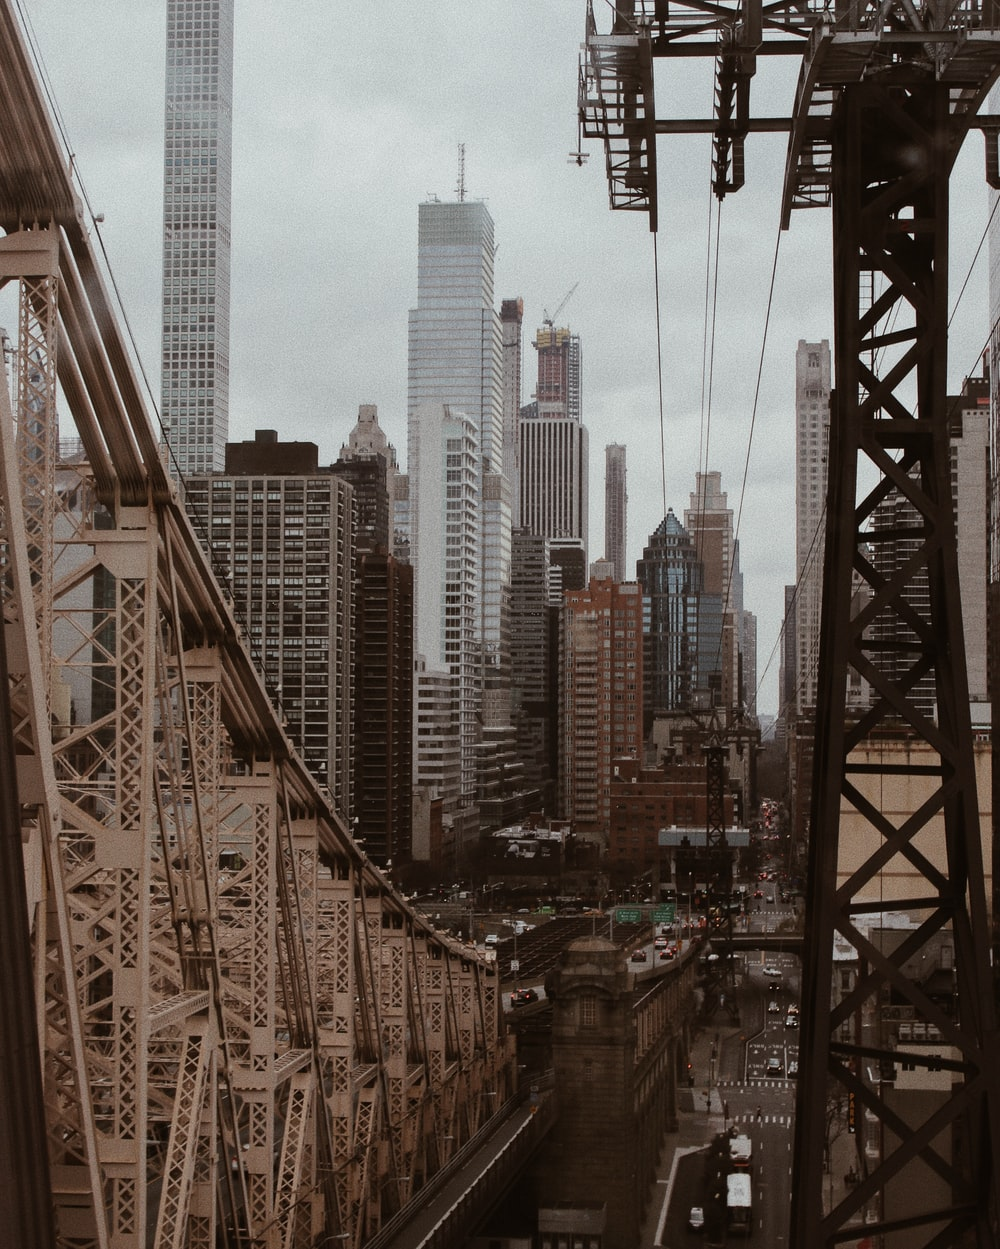 cars on bridge near high rise buildings during daytime